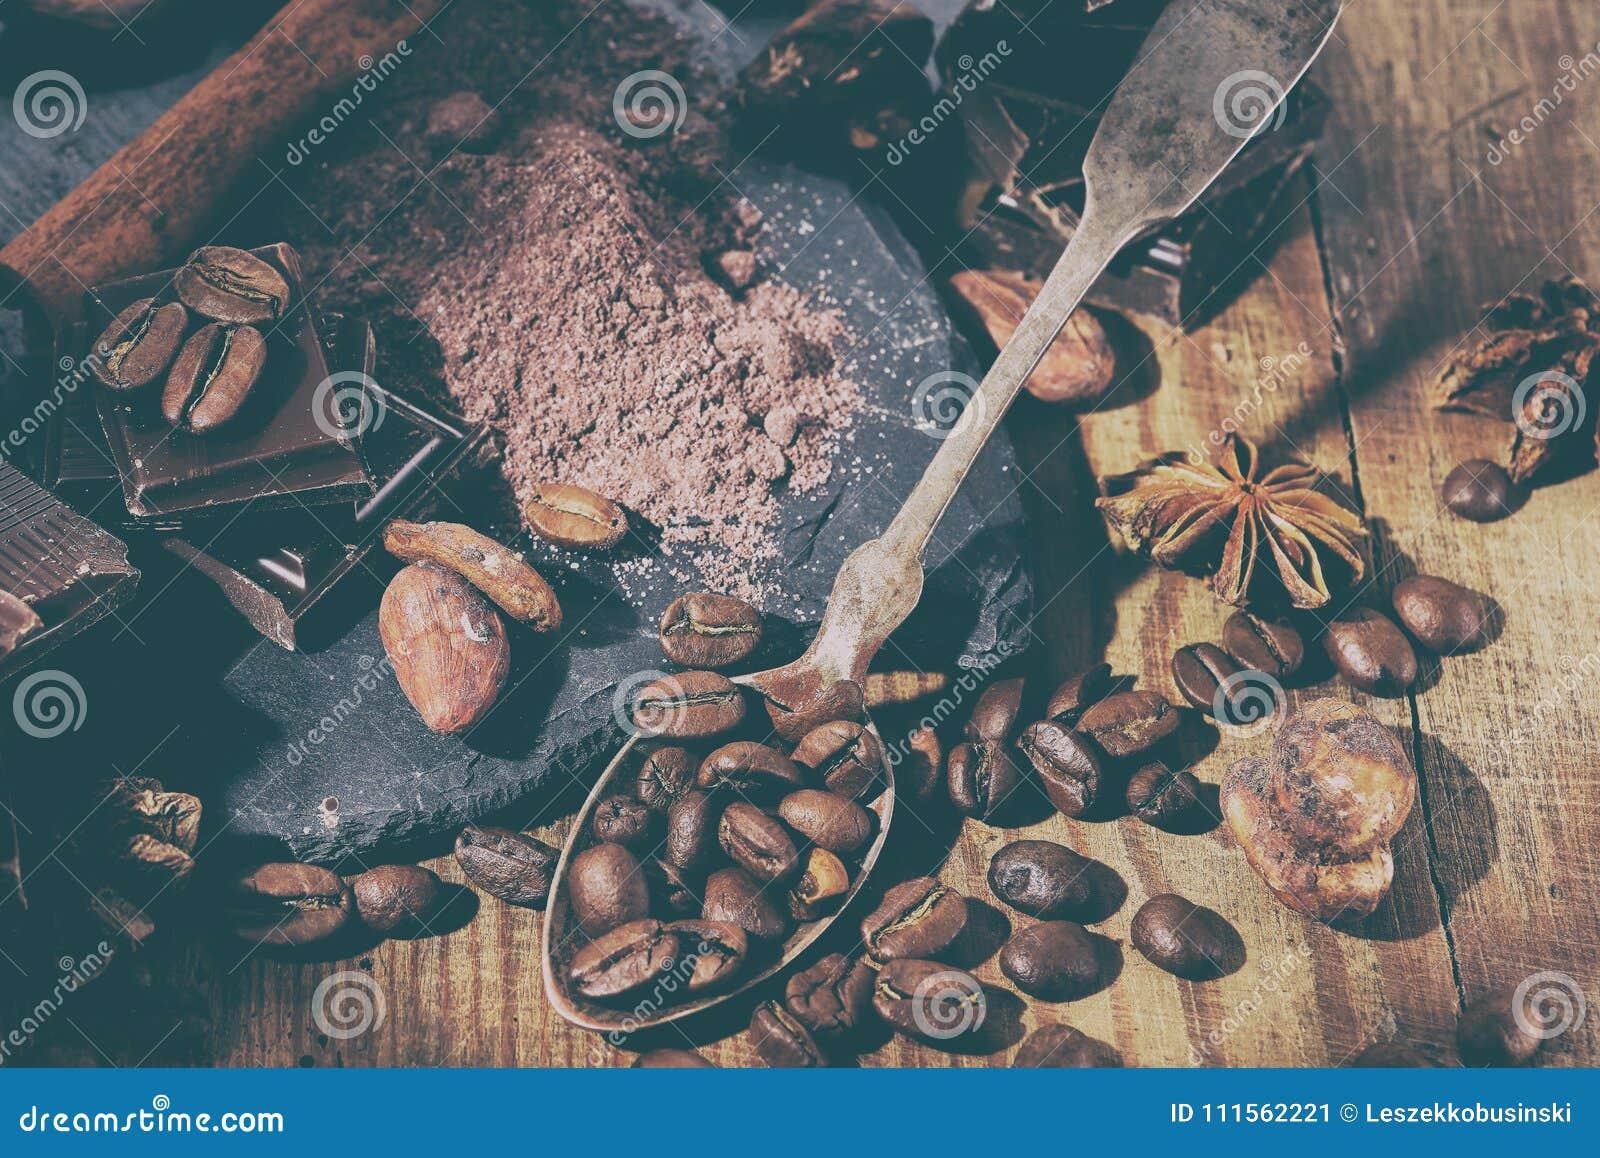 Broken dark chocolate, cocoa powder and coffee beans